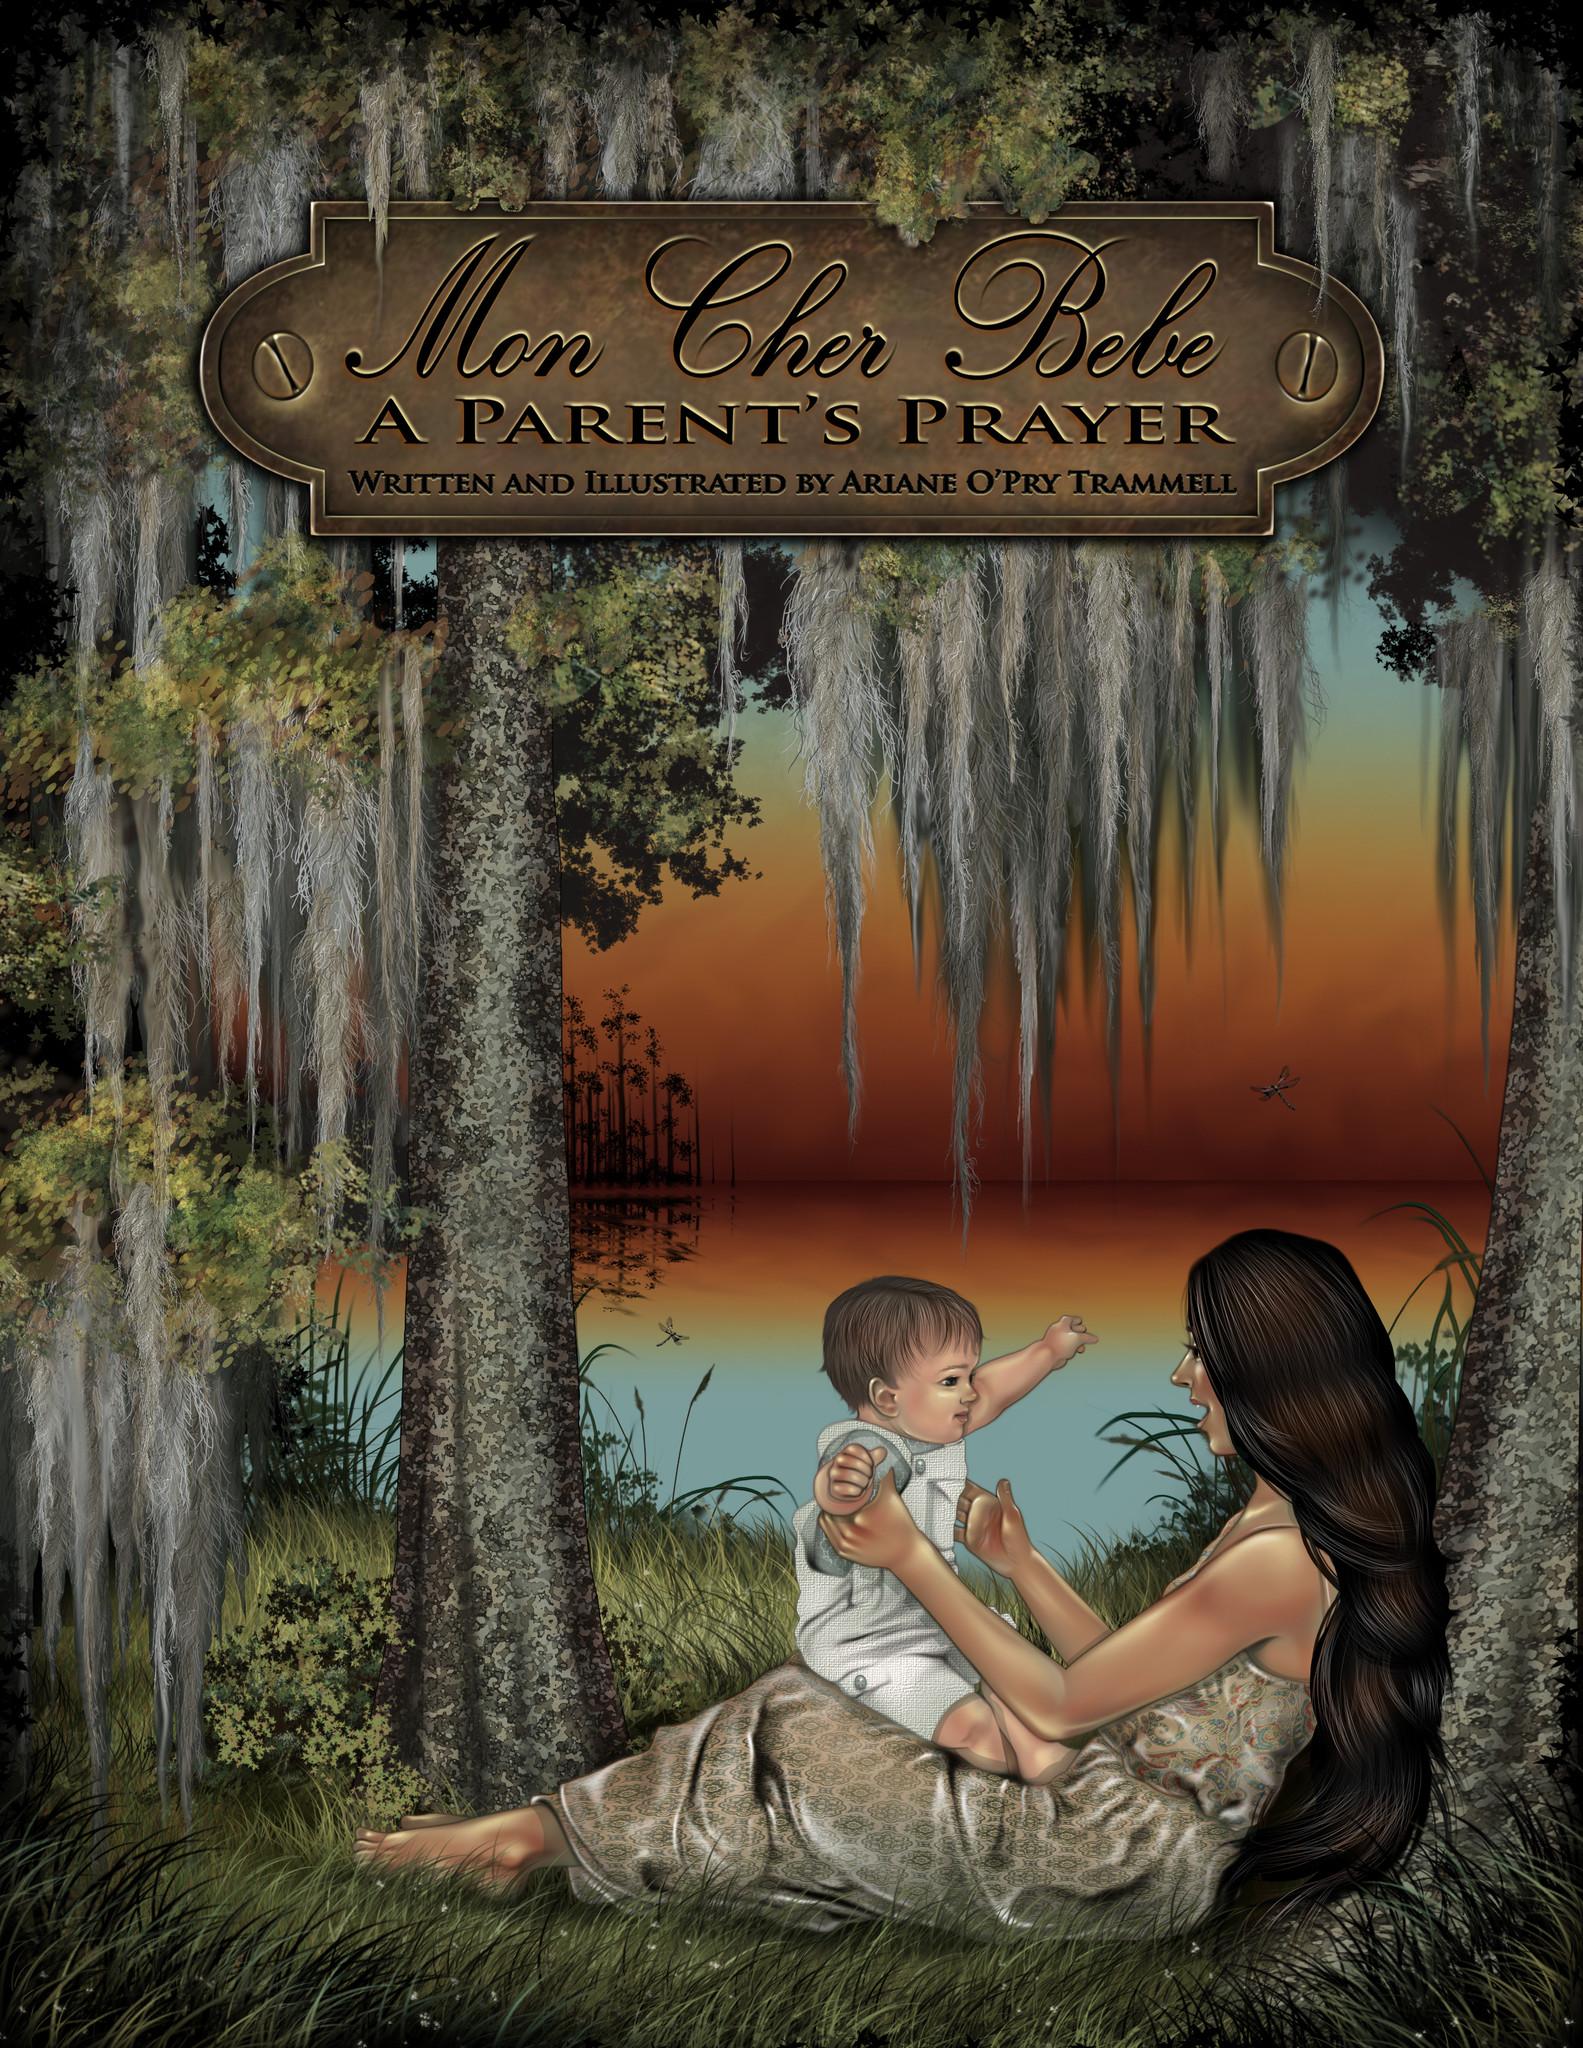 Books Mon Cher Bebe: A Parent's Prayer